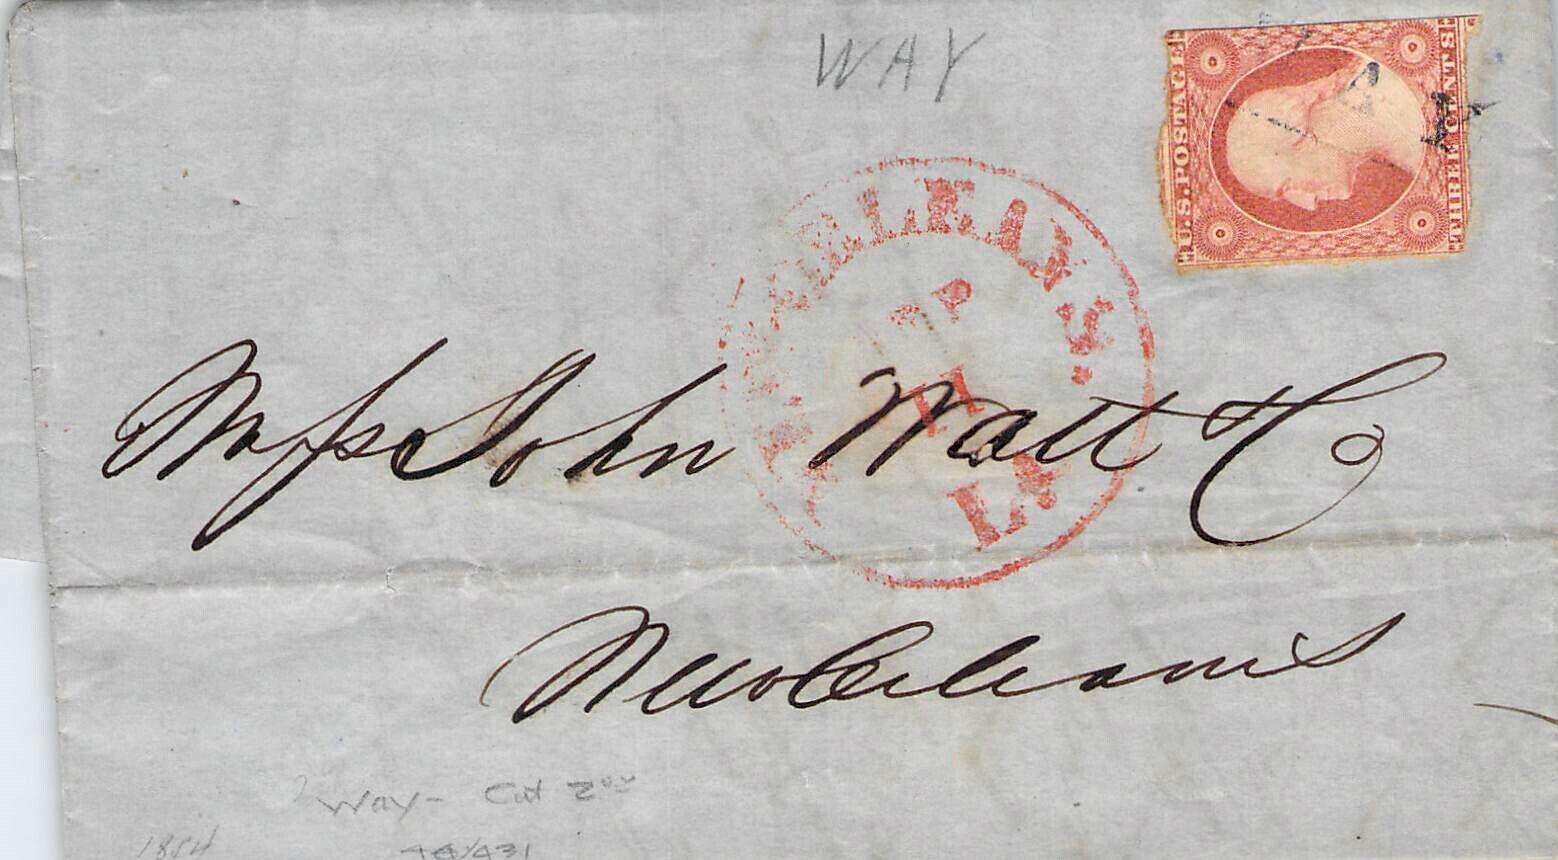 1854 CORRESPONDENCE NEW ORLEANS LA CRAZY COOL CANCEL POSTAL HISTORY